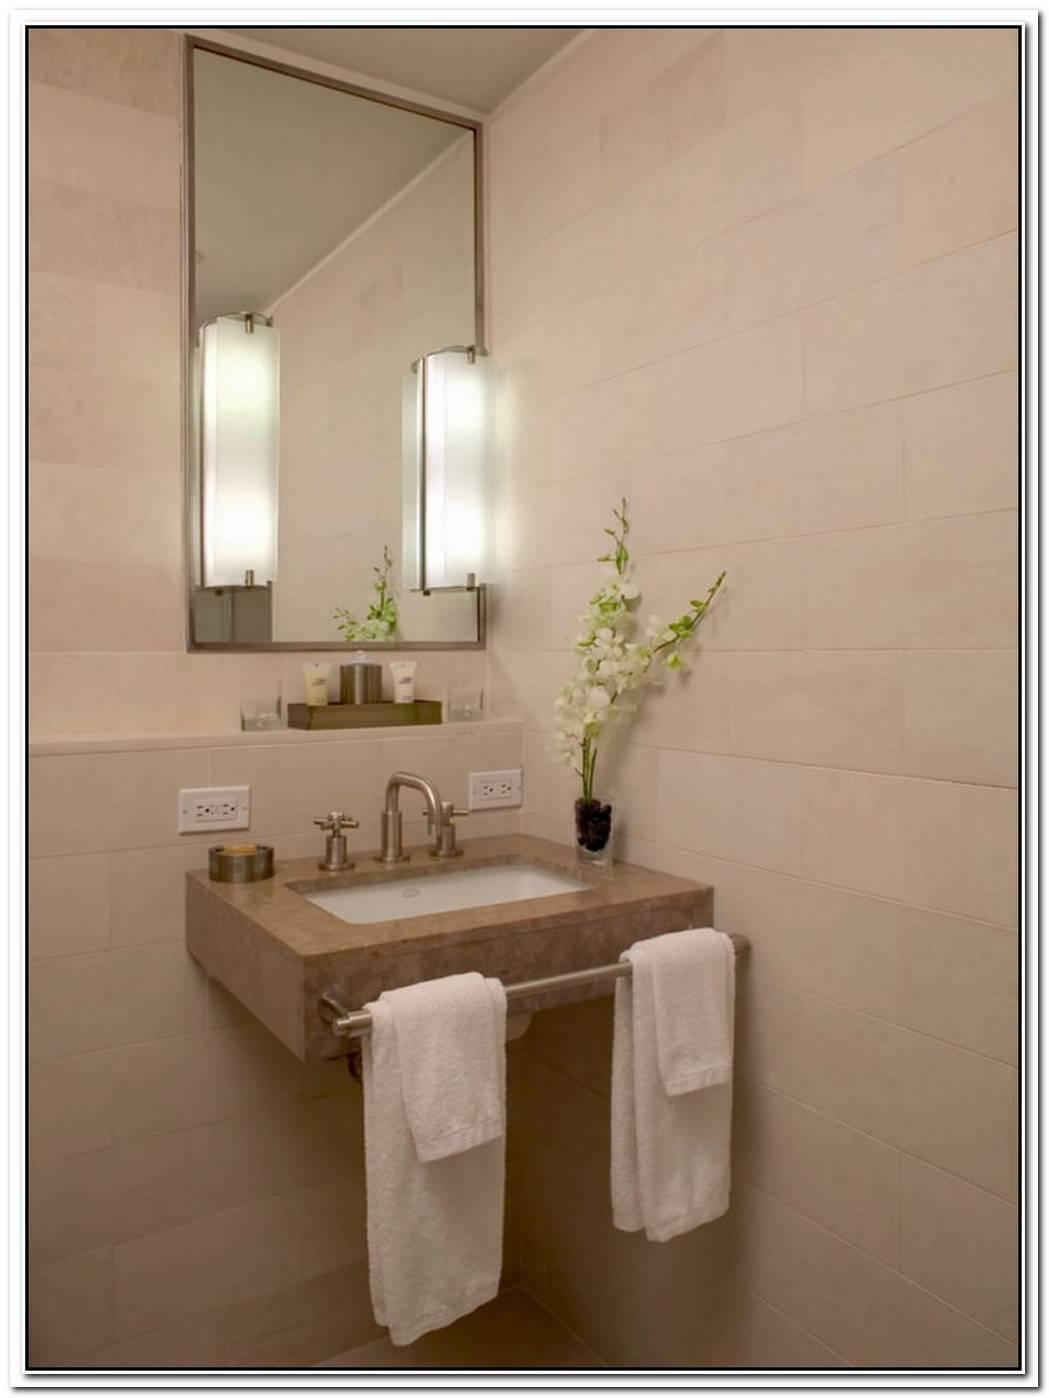 Hotel Bathroom Modern Hospitality